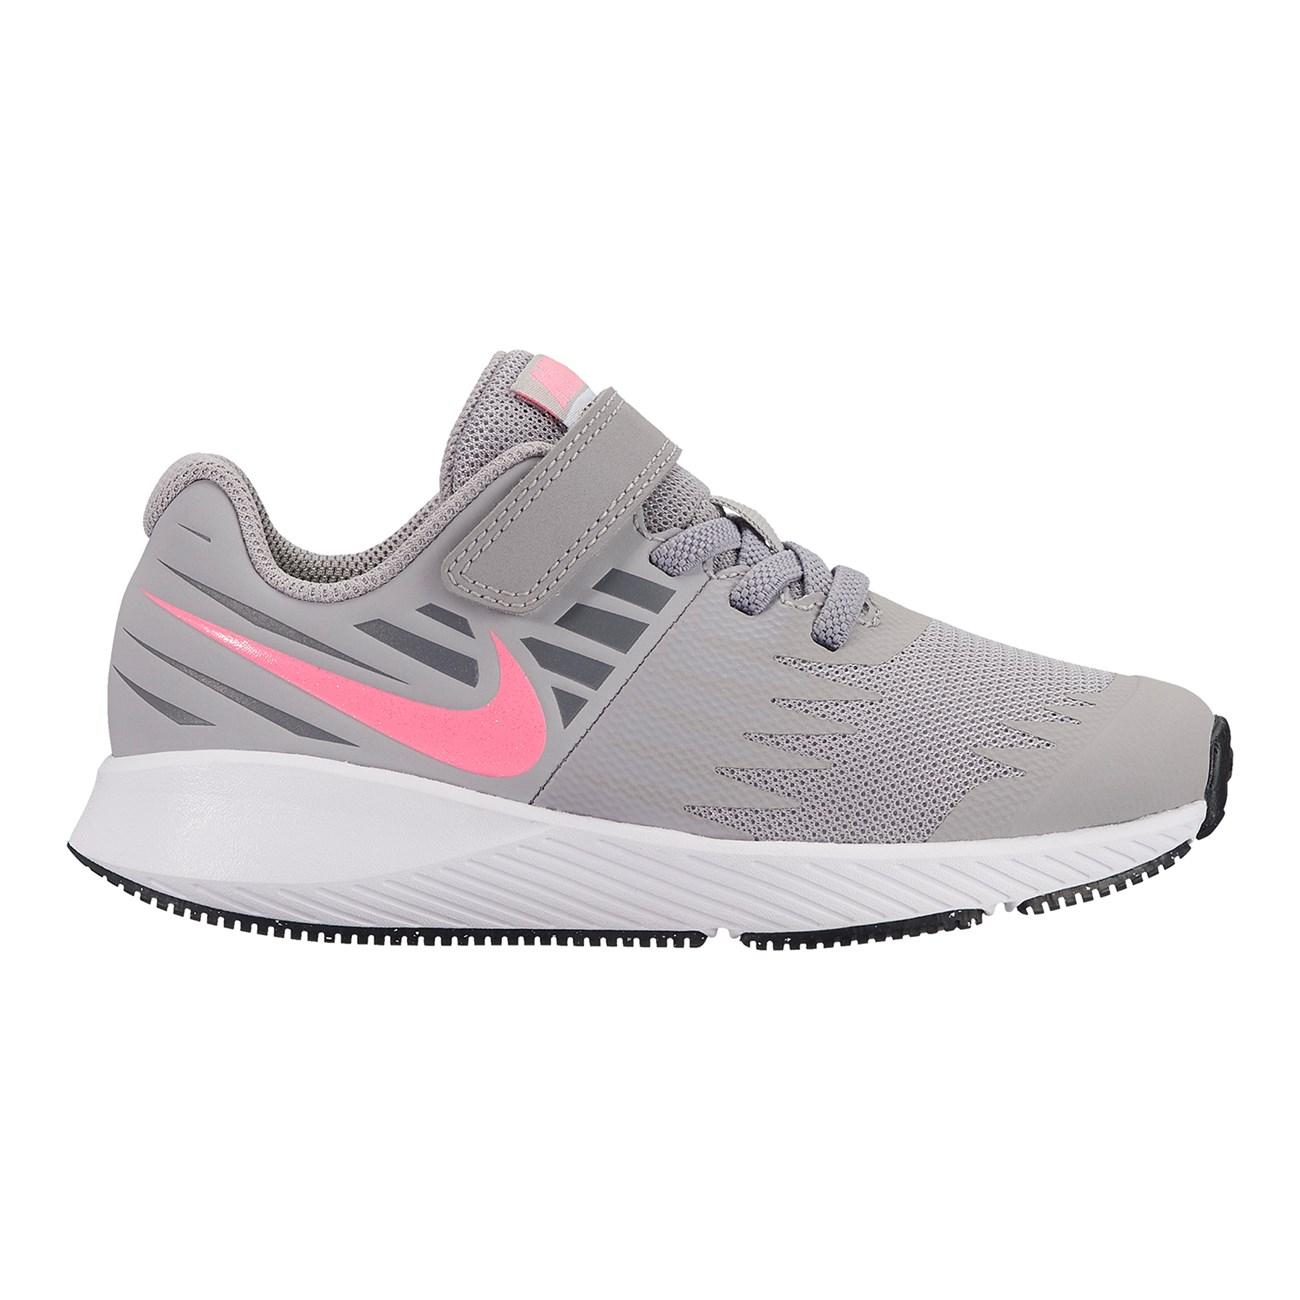 10b3ac85afe NIKE STAR RUNNER PS < Παπούτσια για Τρέξιμο | INTERSPORT